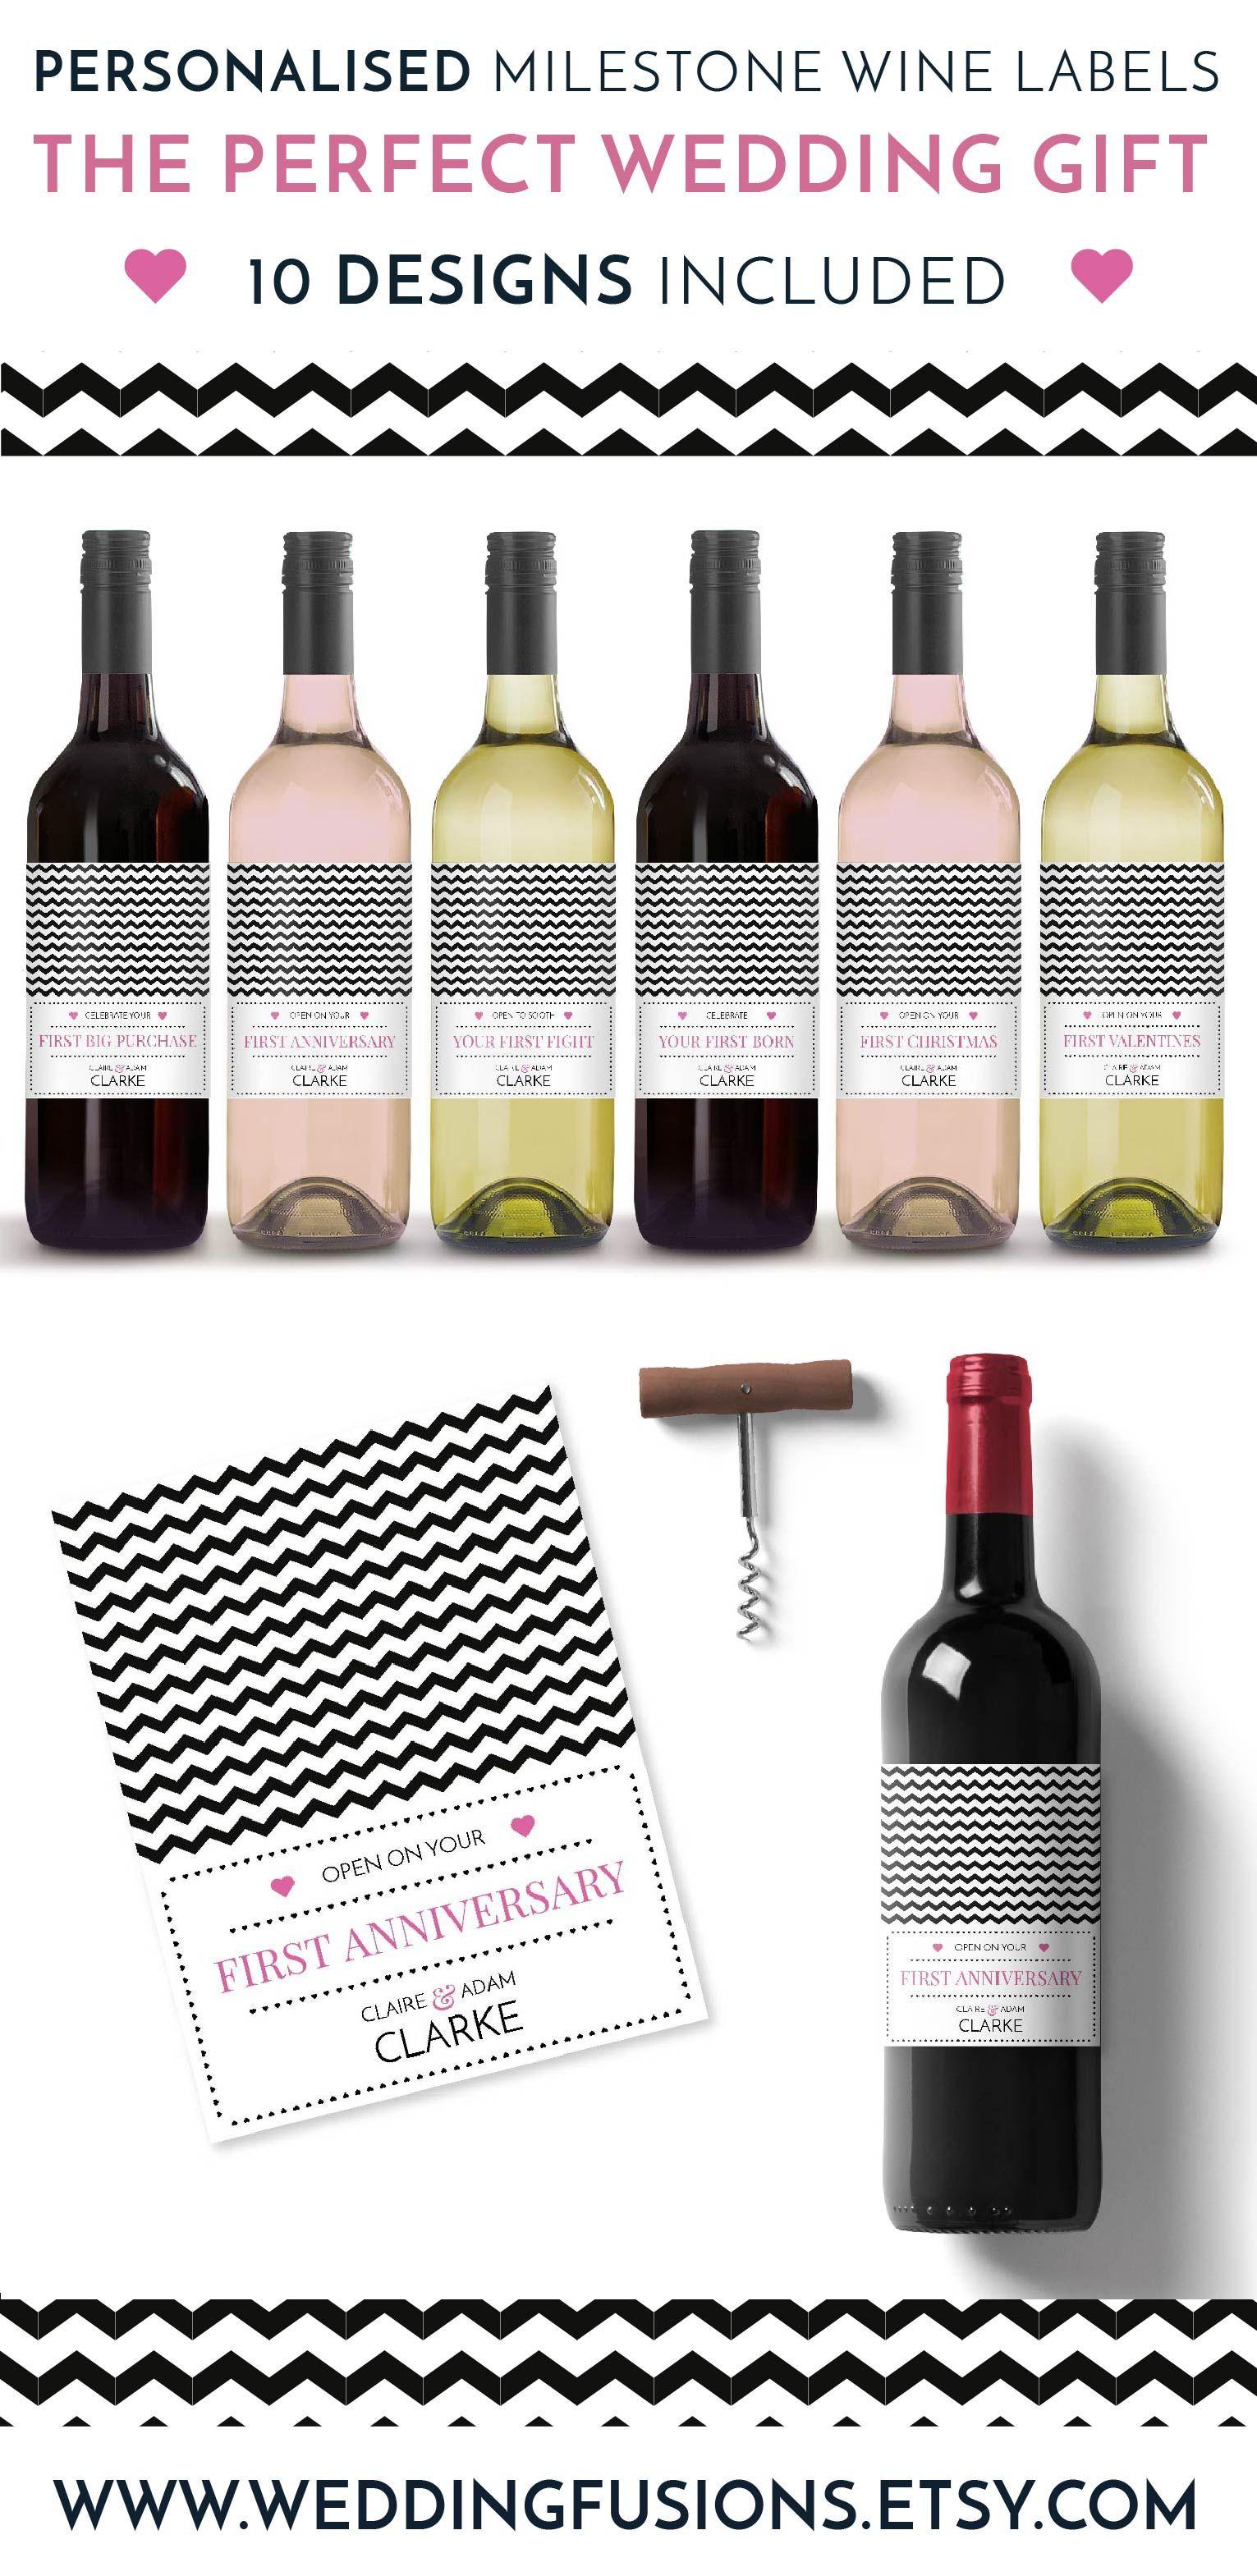 Wedding Gift Idea wine label milestone Wedding Gifts For the Bride